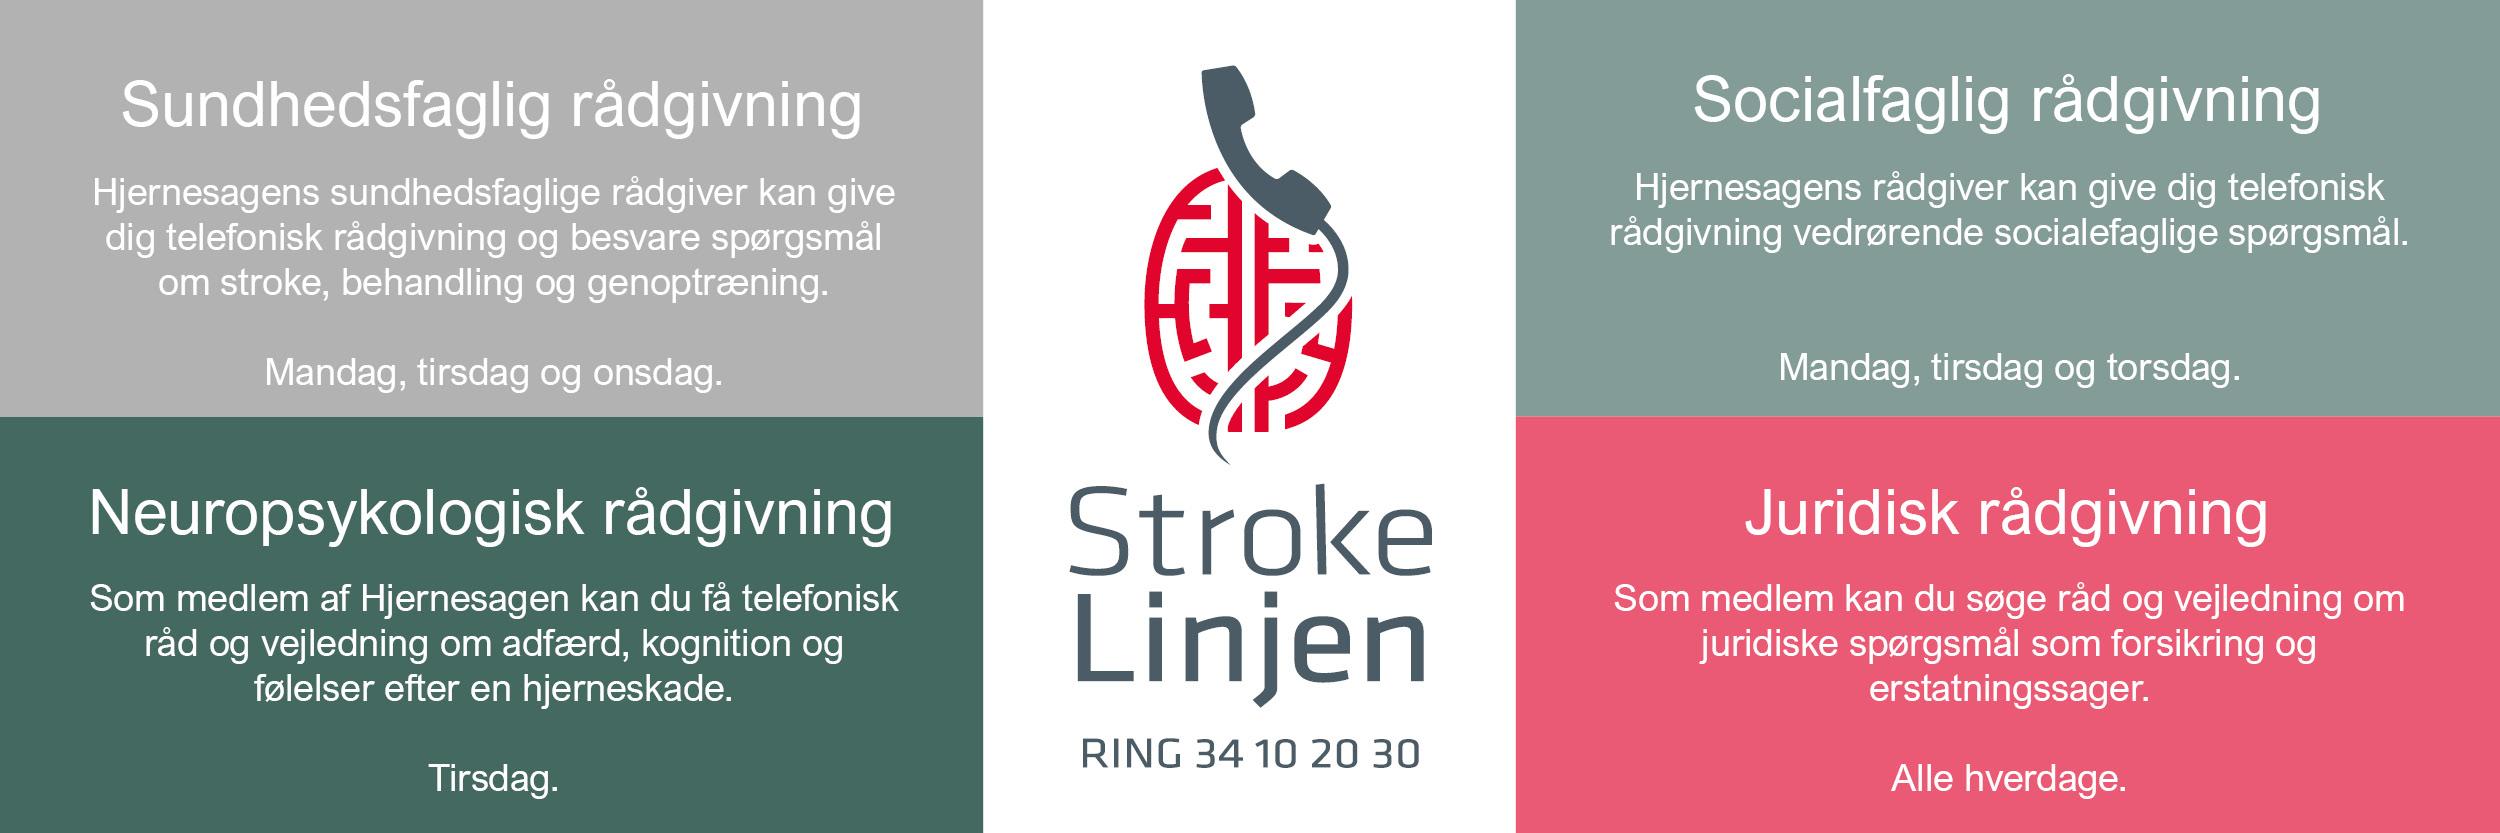 strokelinjens rådgivning